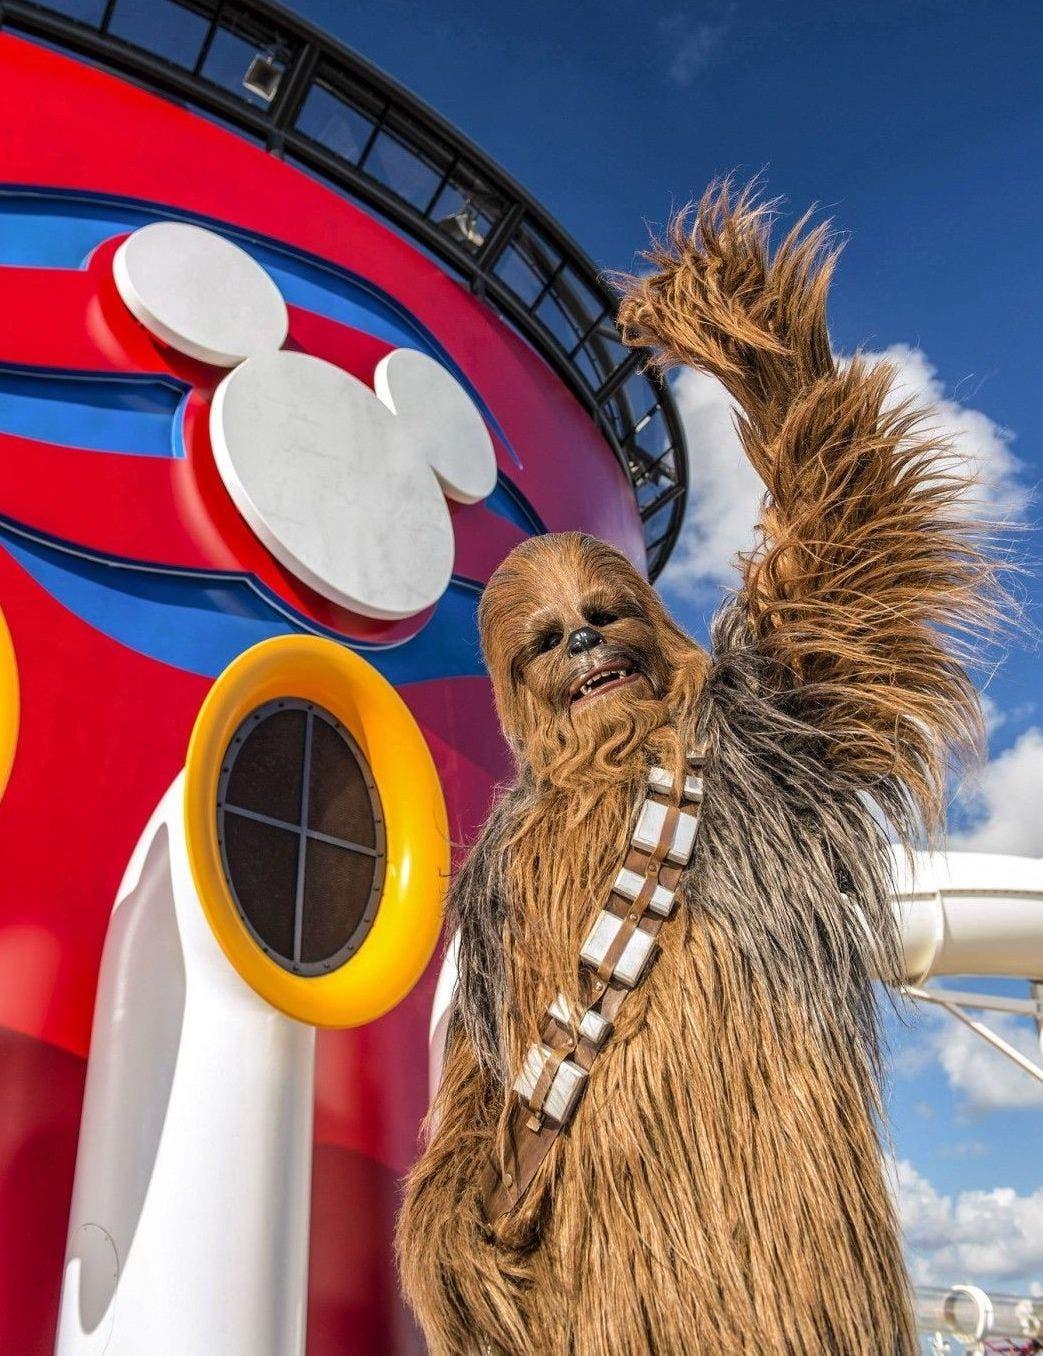 Todos los personajes de la saga viajan a bordo. Foto: Disney Cruises.